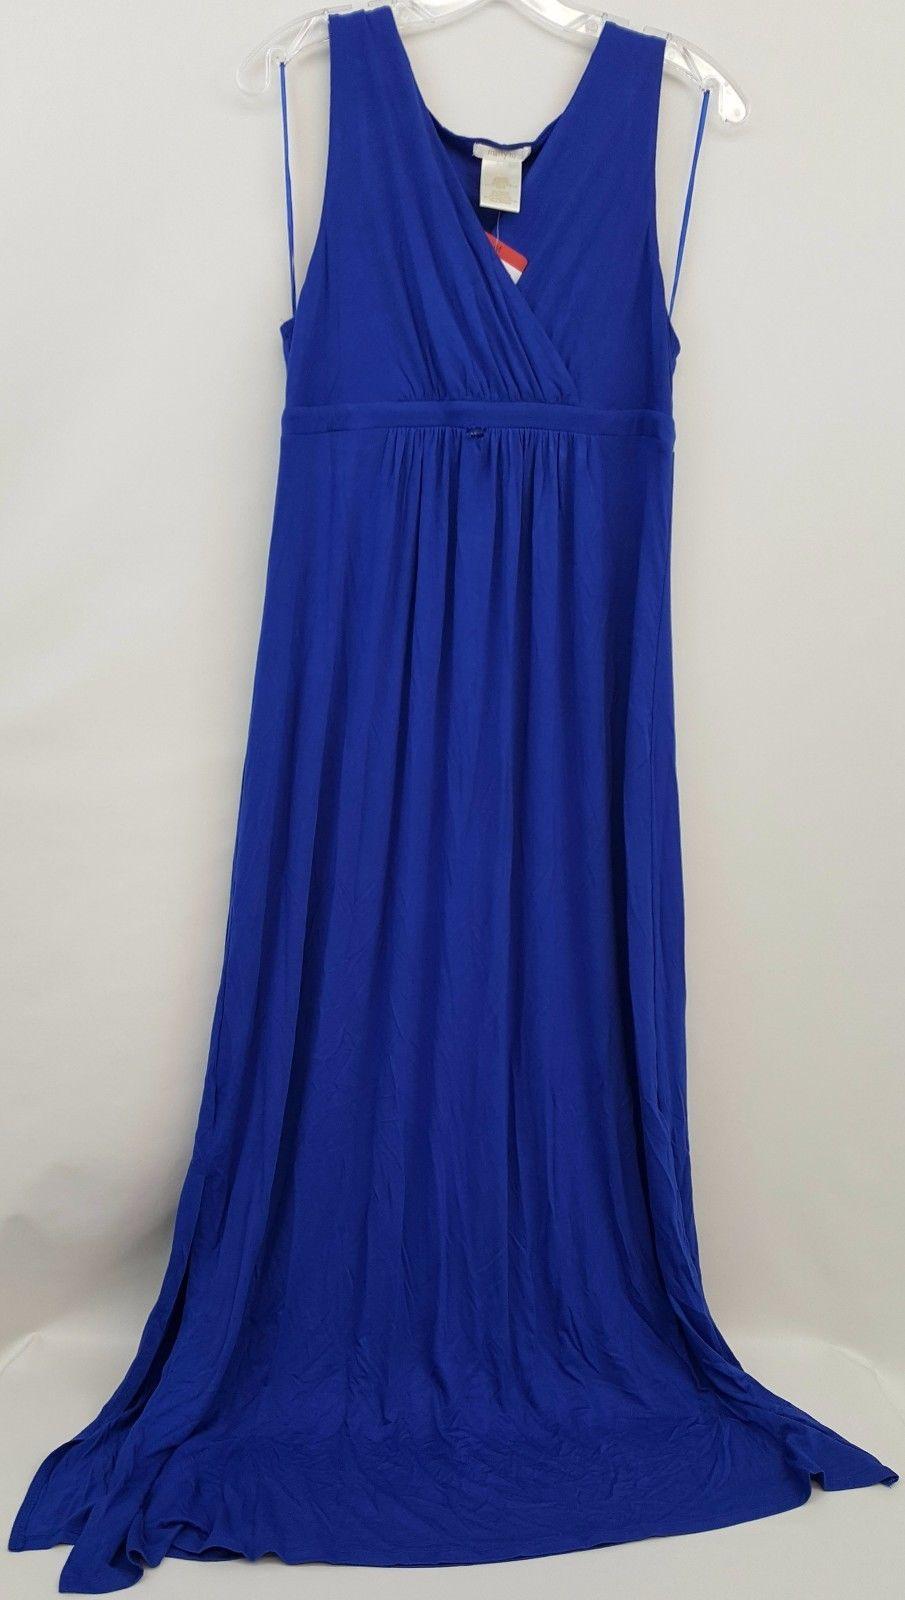 NWT Women's Matty M Long Maxi Dress Cobalt Size M https://t.co/s6453nR7PN https://t.co/s6453nR7PN